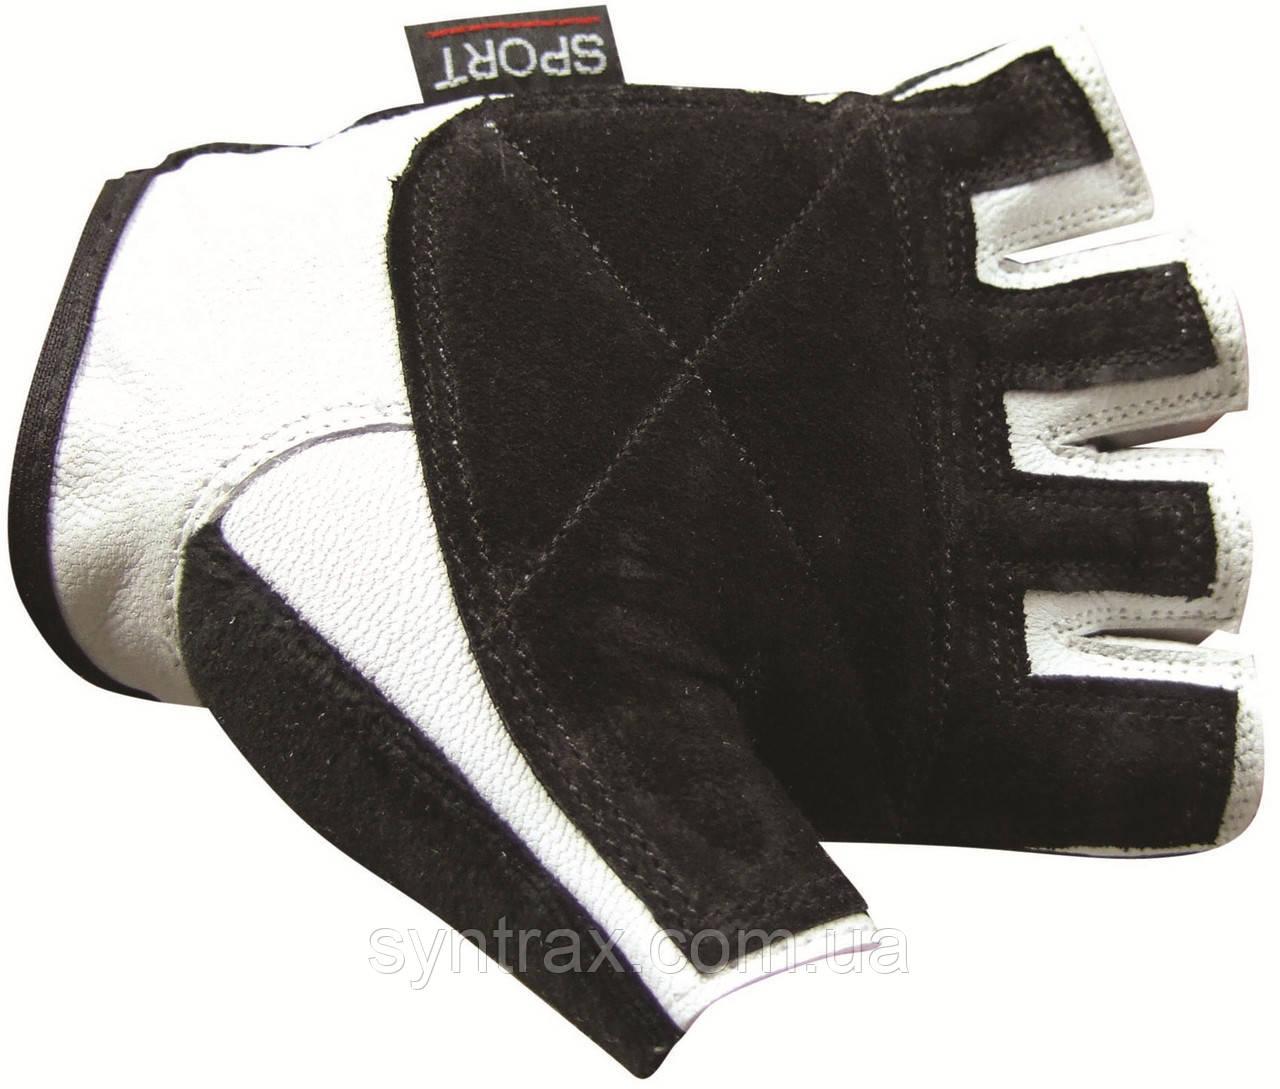 Power System Workout PS 2200 XS рукавички для спортзалу